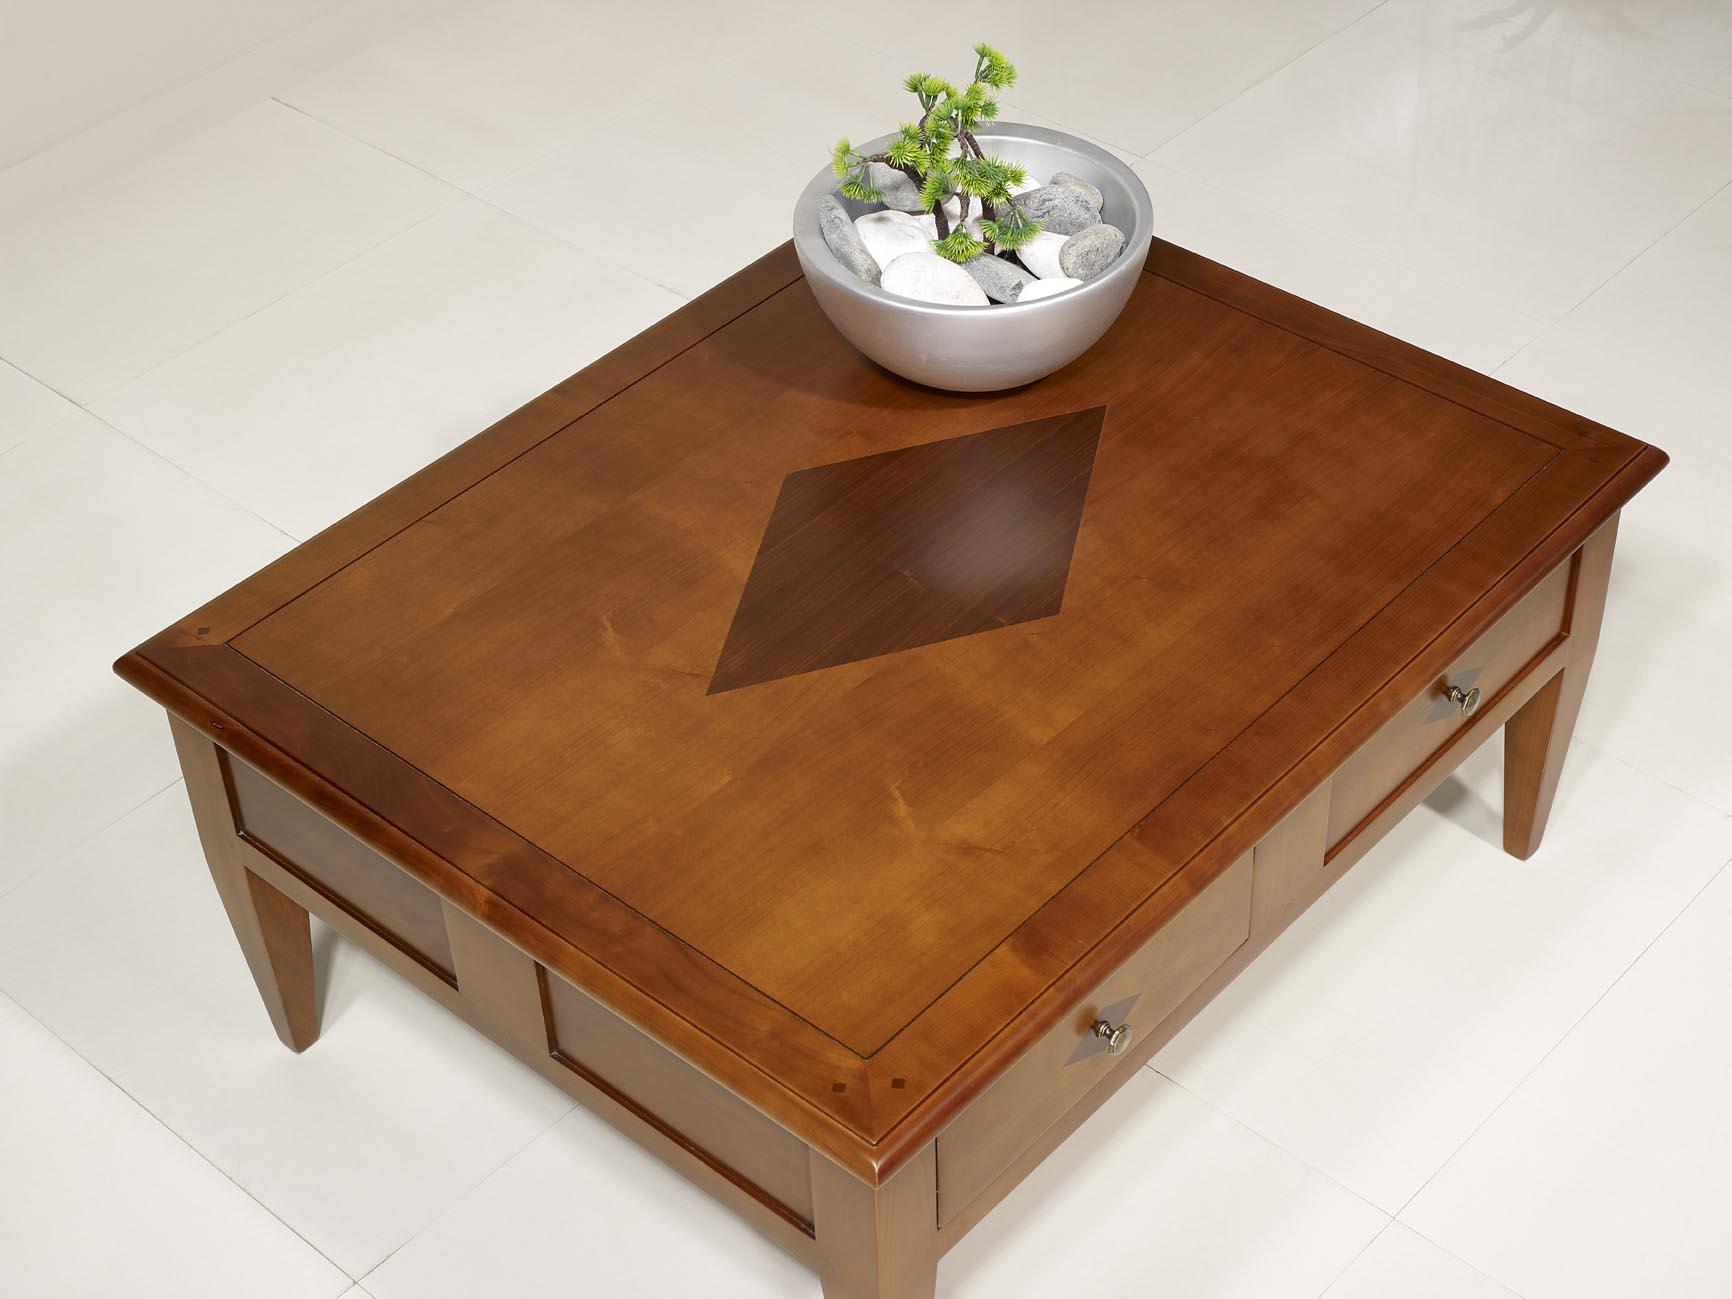 table basse rectangulaire 100x80 en merisier de style directoire meuble en merisier massif. Black Bedroom Furniture Sets. Home Design Ideas